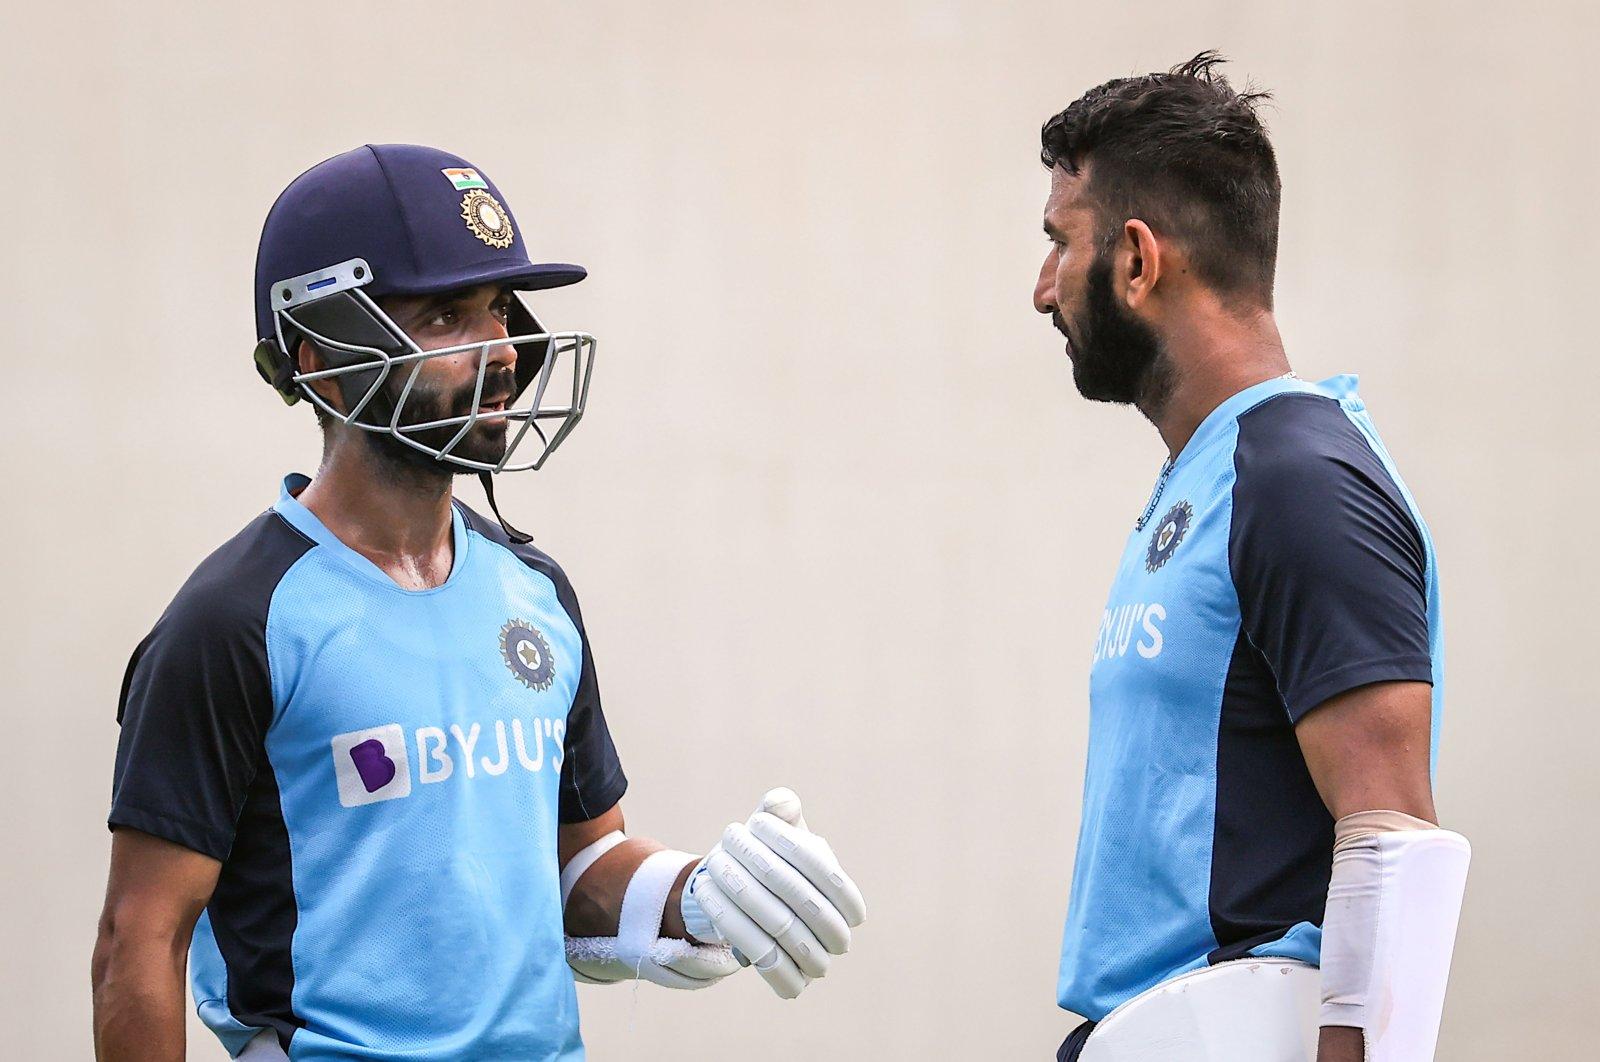 India's Cheteshwar Pujara (R) talks to the team's captain Ajinkya Rahane during a training session, in Sydney, Australia, Jan. 5, 2021. (AFP Photo)